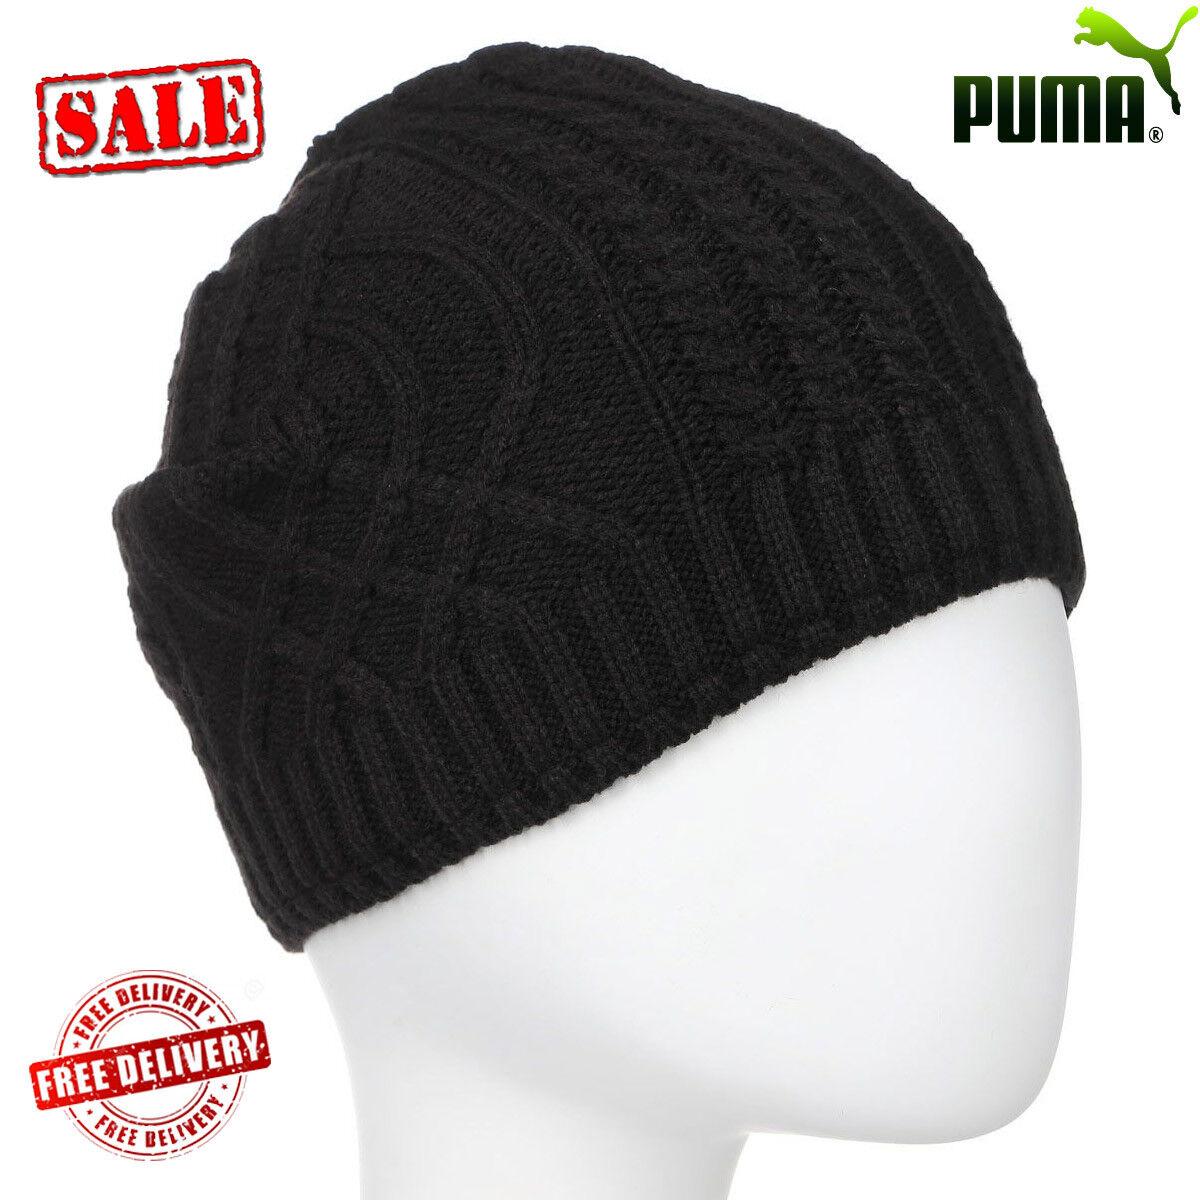 3b1b9e141b5 Puma Mele Cable Knit Casual Urban Winter Fashion Warm Beanie Hats Caps  Unisex UK